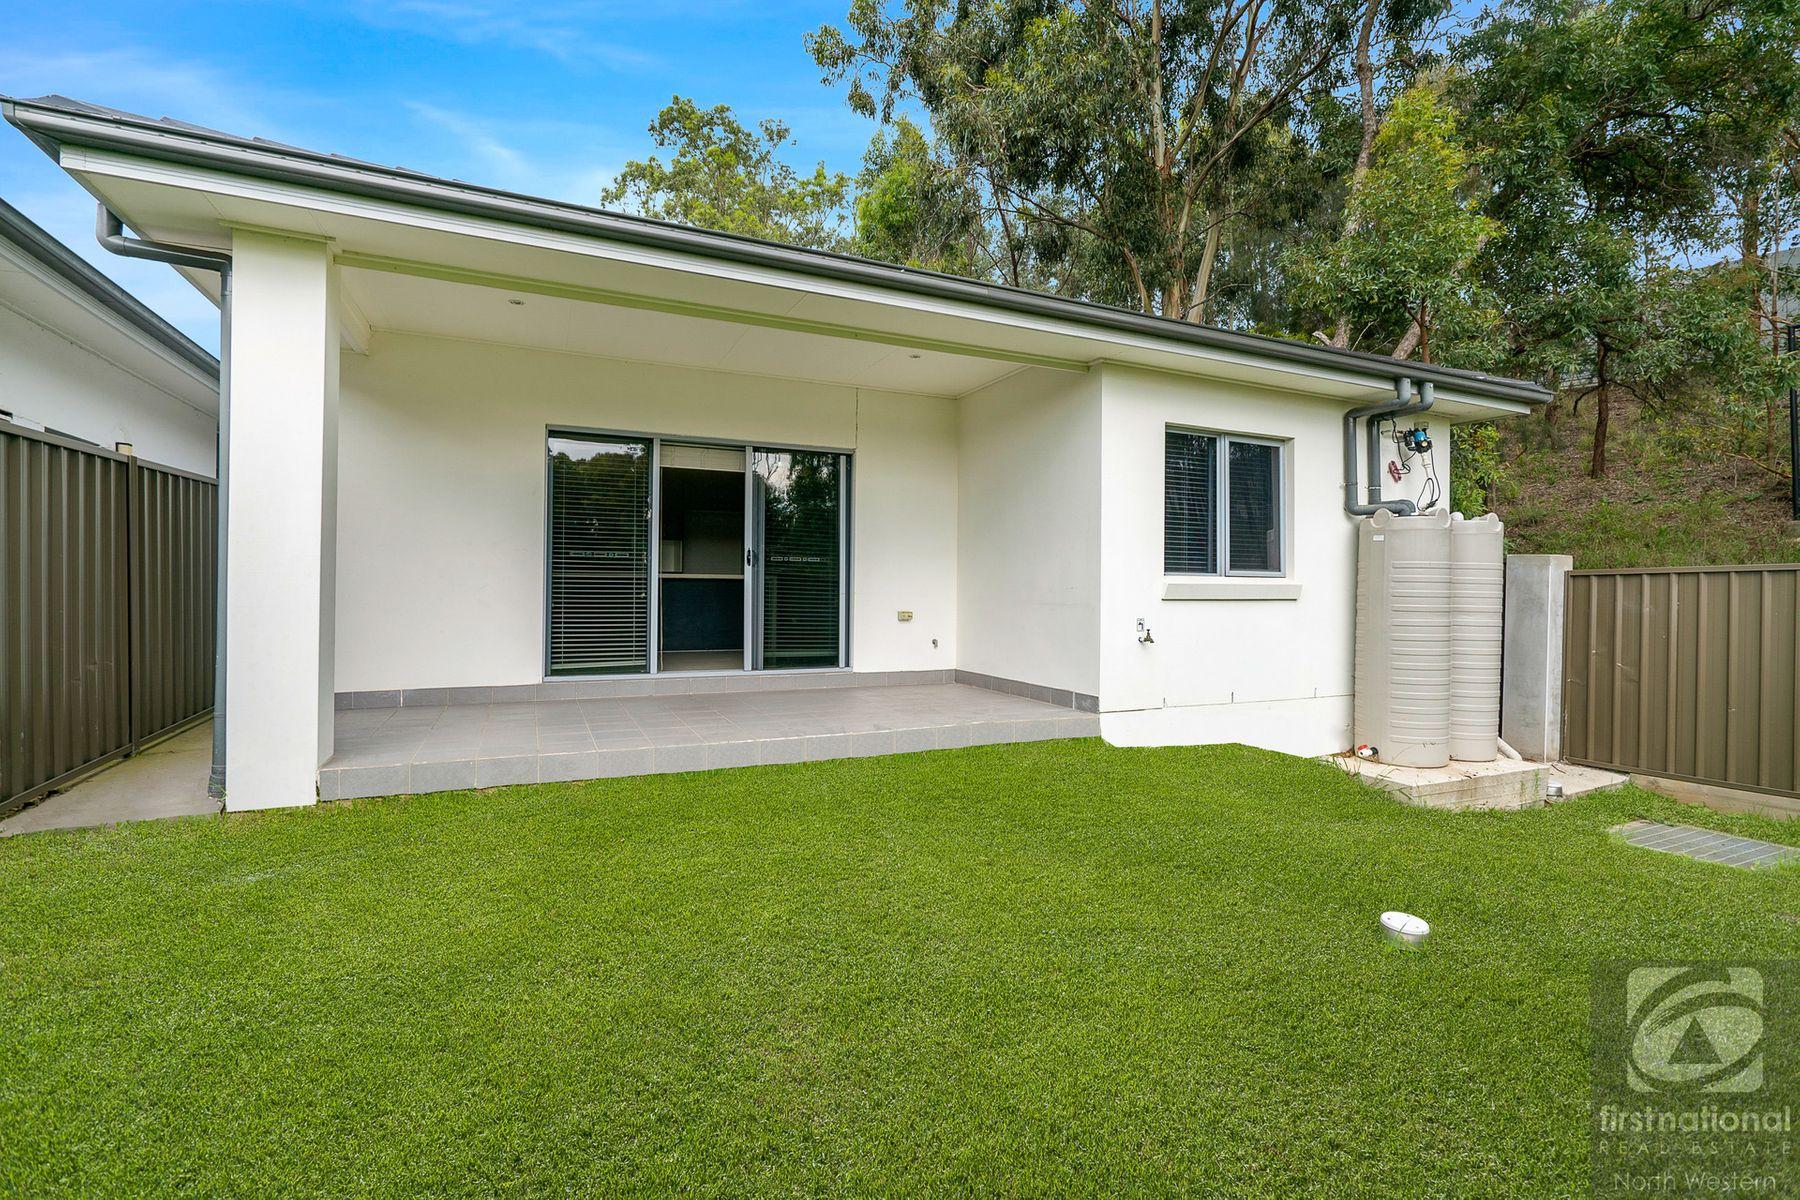 6/12 Burrowes Grove, Dean Park, NSW 2761